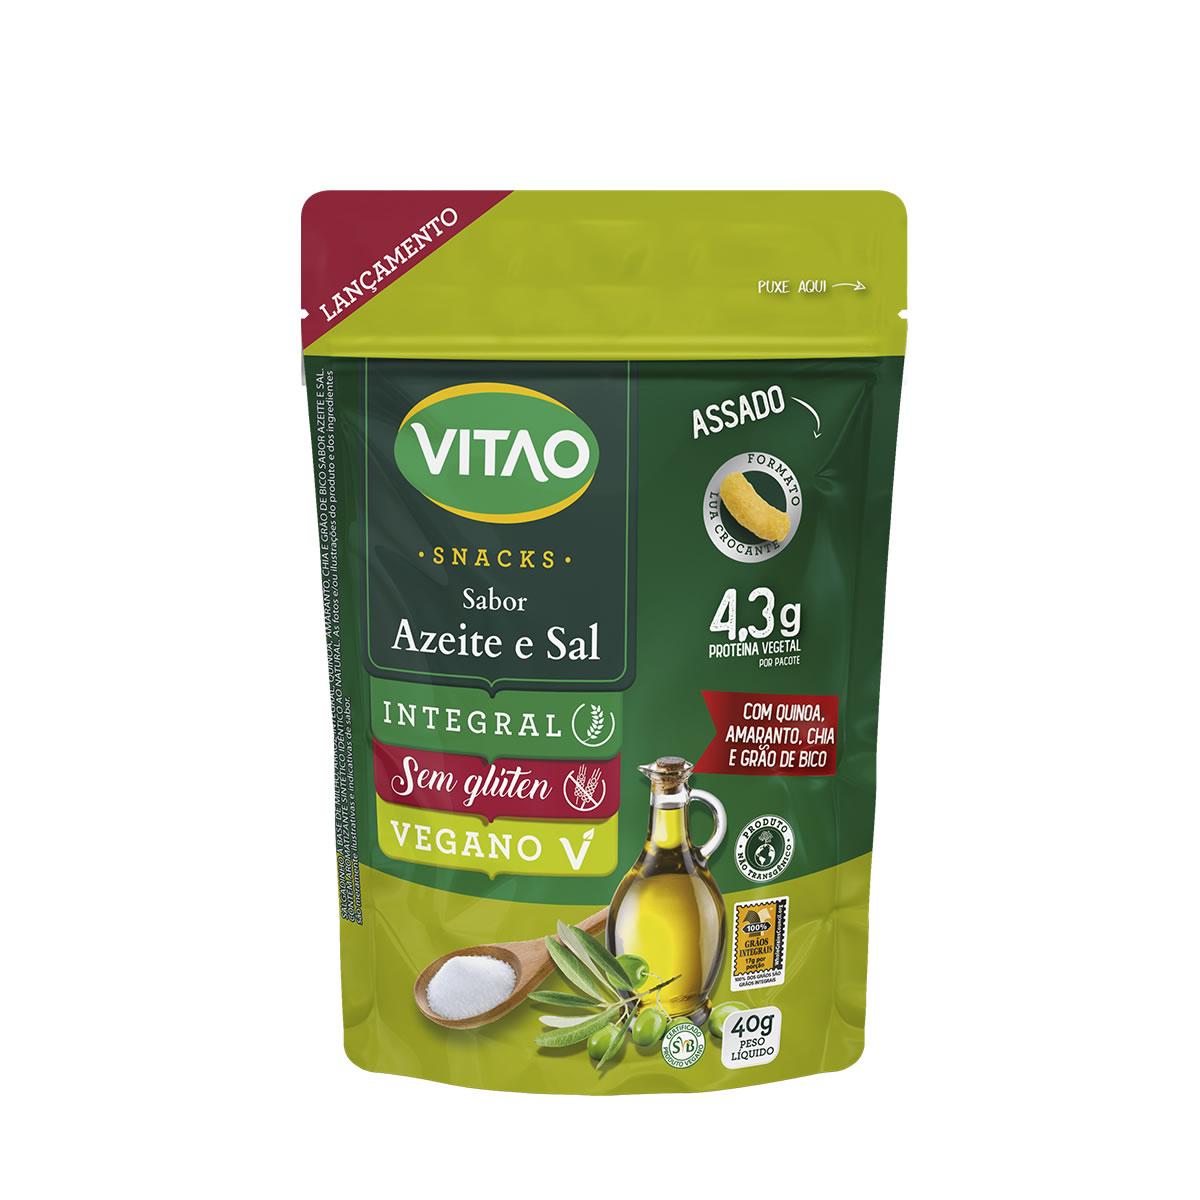 Snacks Integral Sabor Azeite e Sal 40g - Vitao